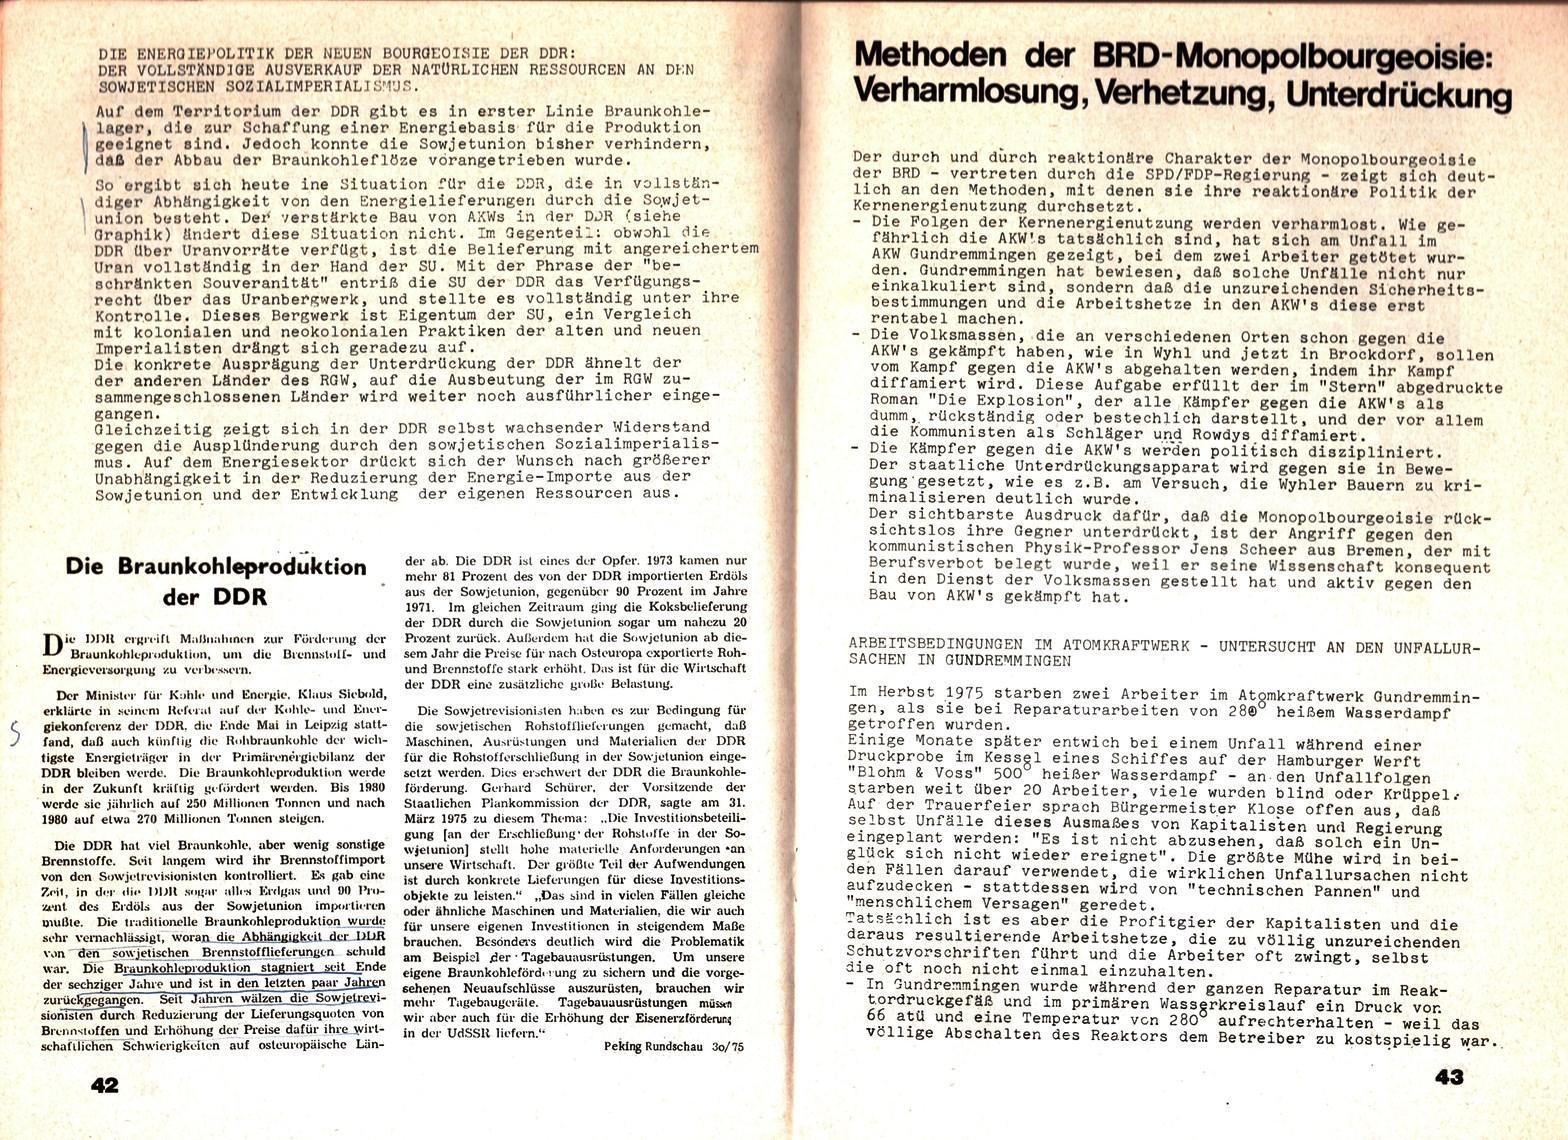 KSV_1976_Atomenergie_im_Kapitalismus_023